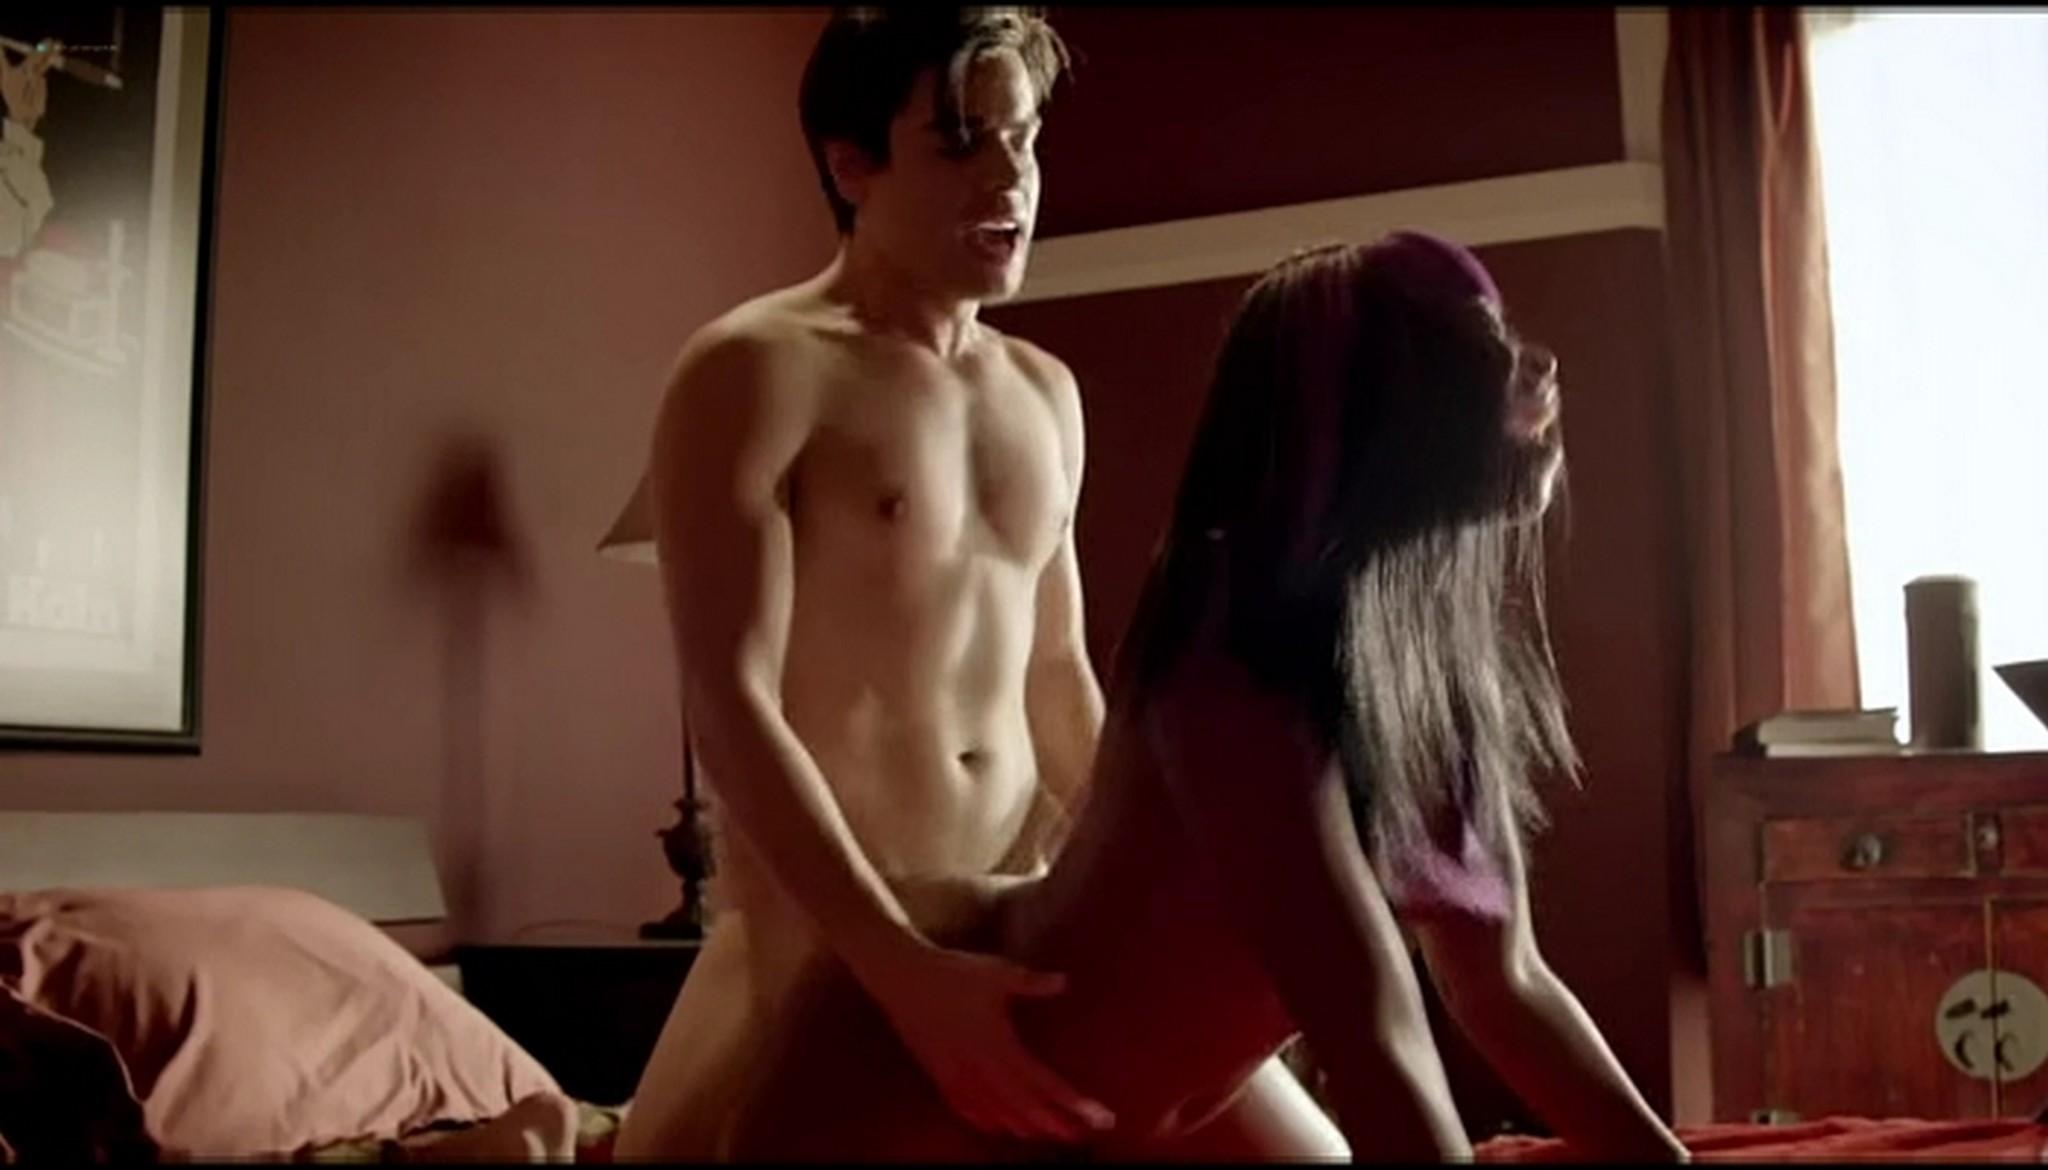 Gigi Feshold nude sex Scheana Shay, Tiffany Tynes nude hot sex too - Femme Fatales (2012) (12)